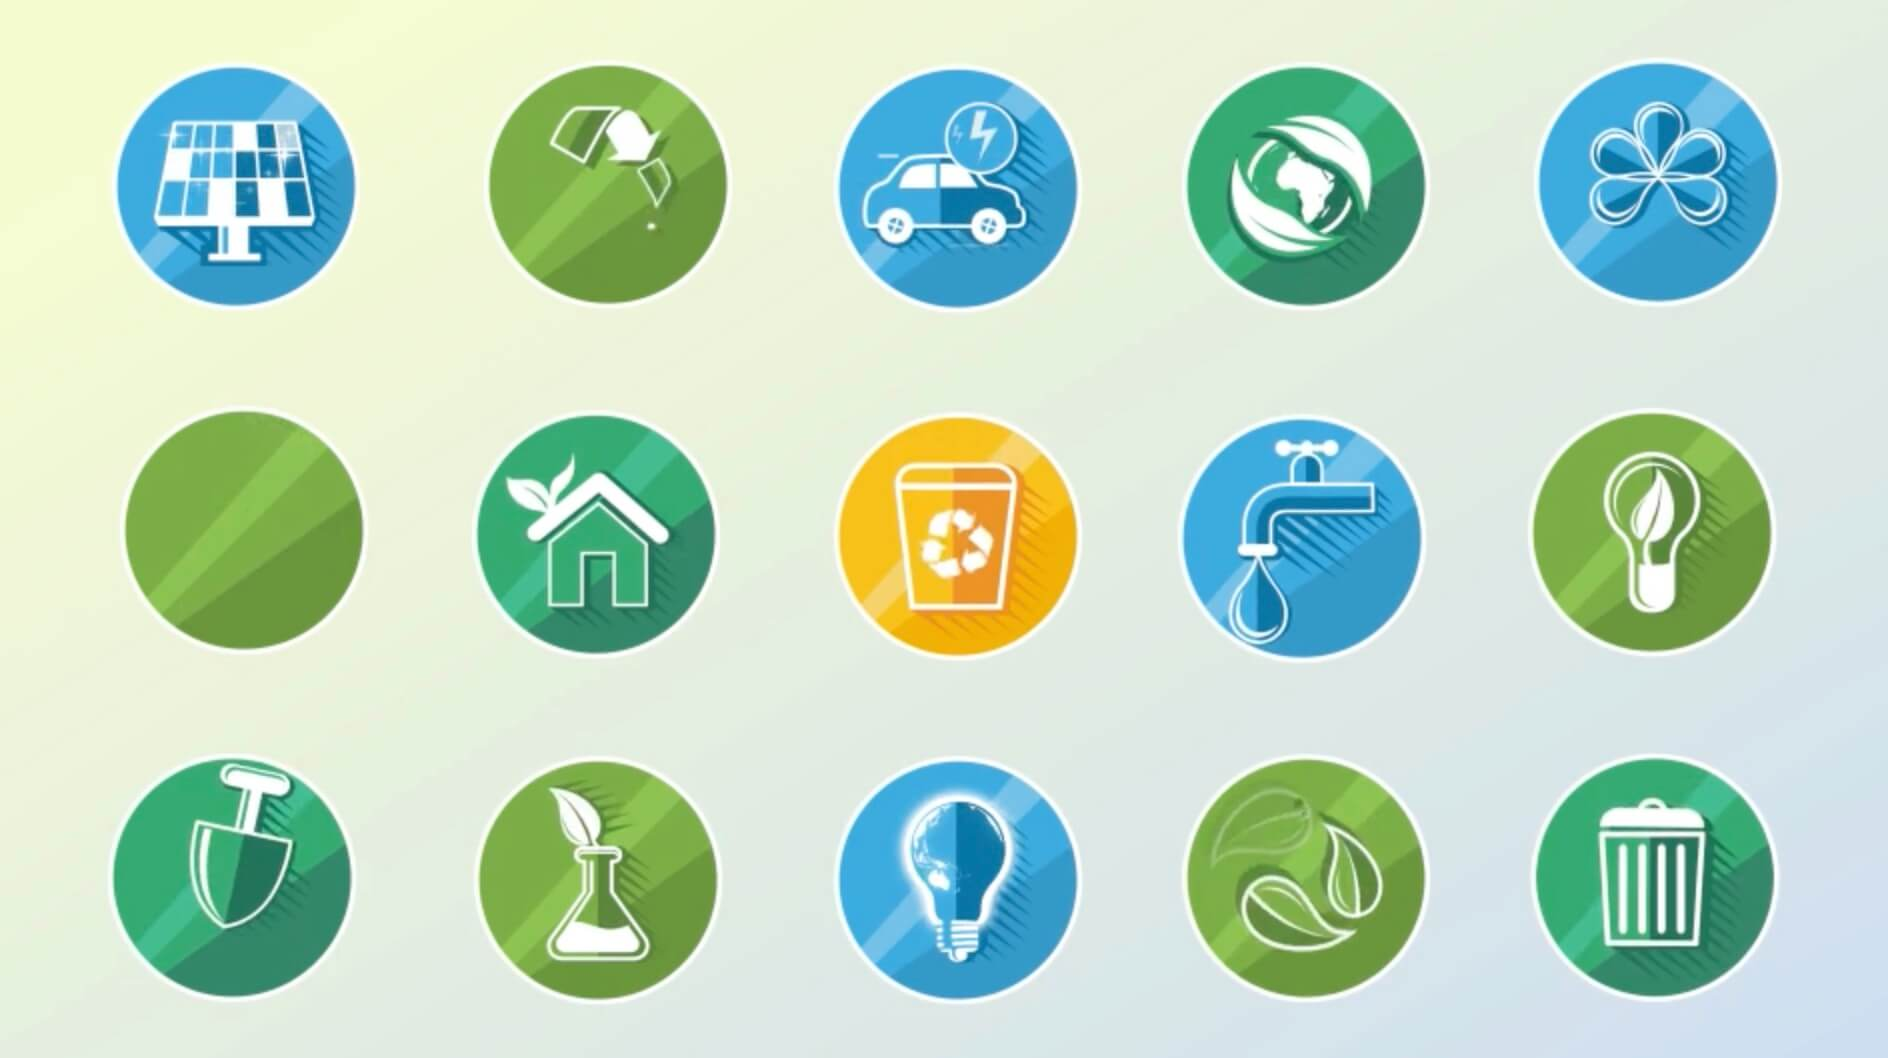 AE模板-生态概念动态icon图标插图